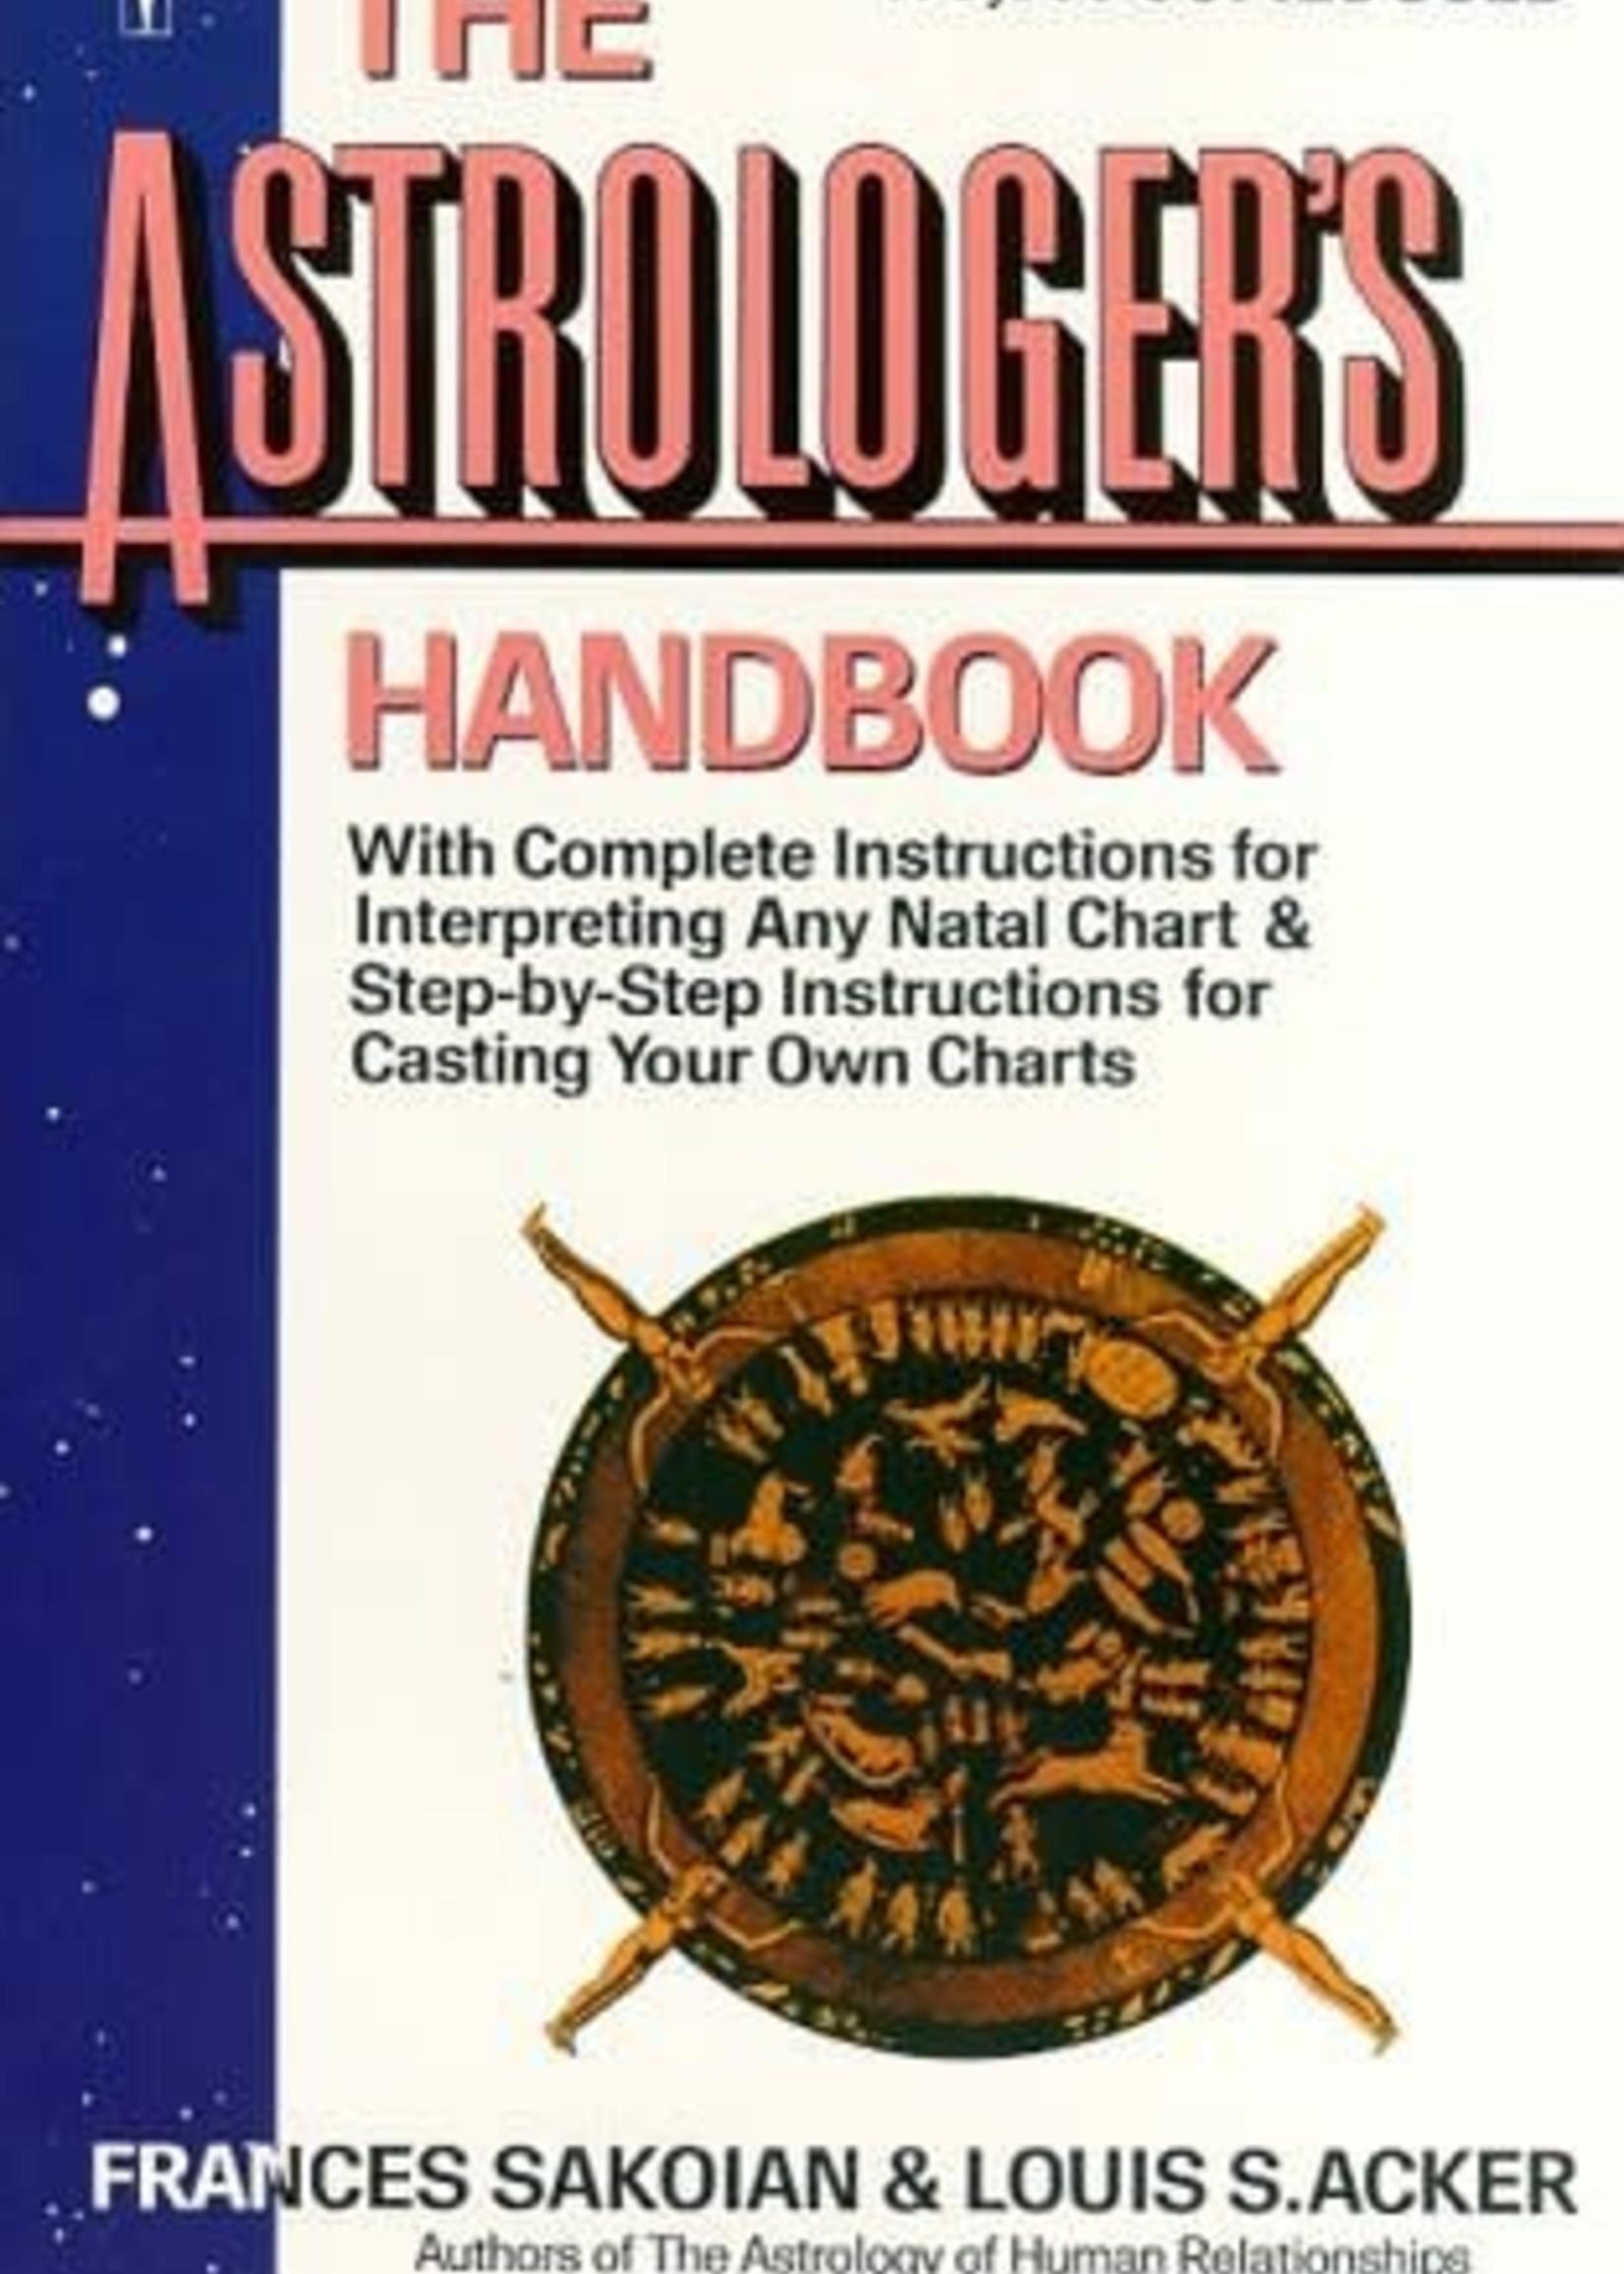 The Astrologer's Handbook by Frances Sakoian,  Louis S. Acker